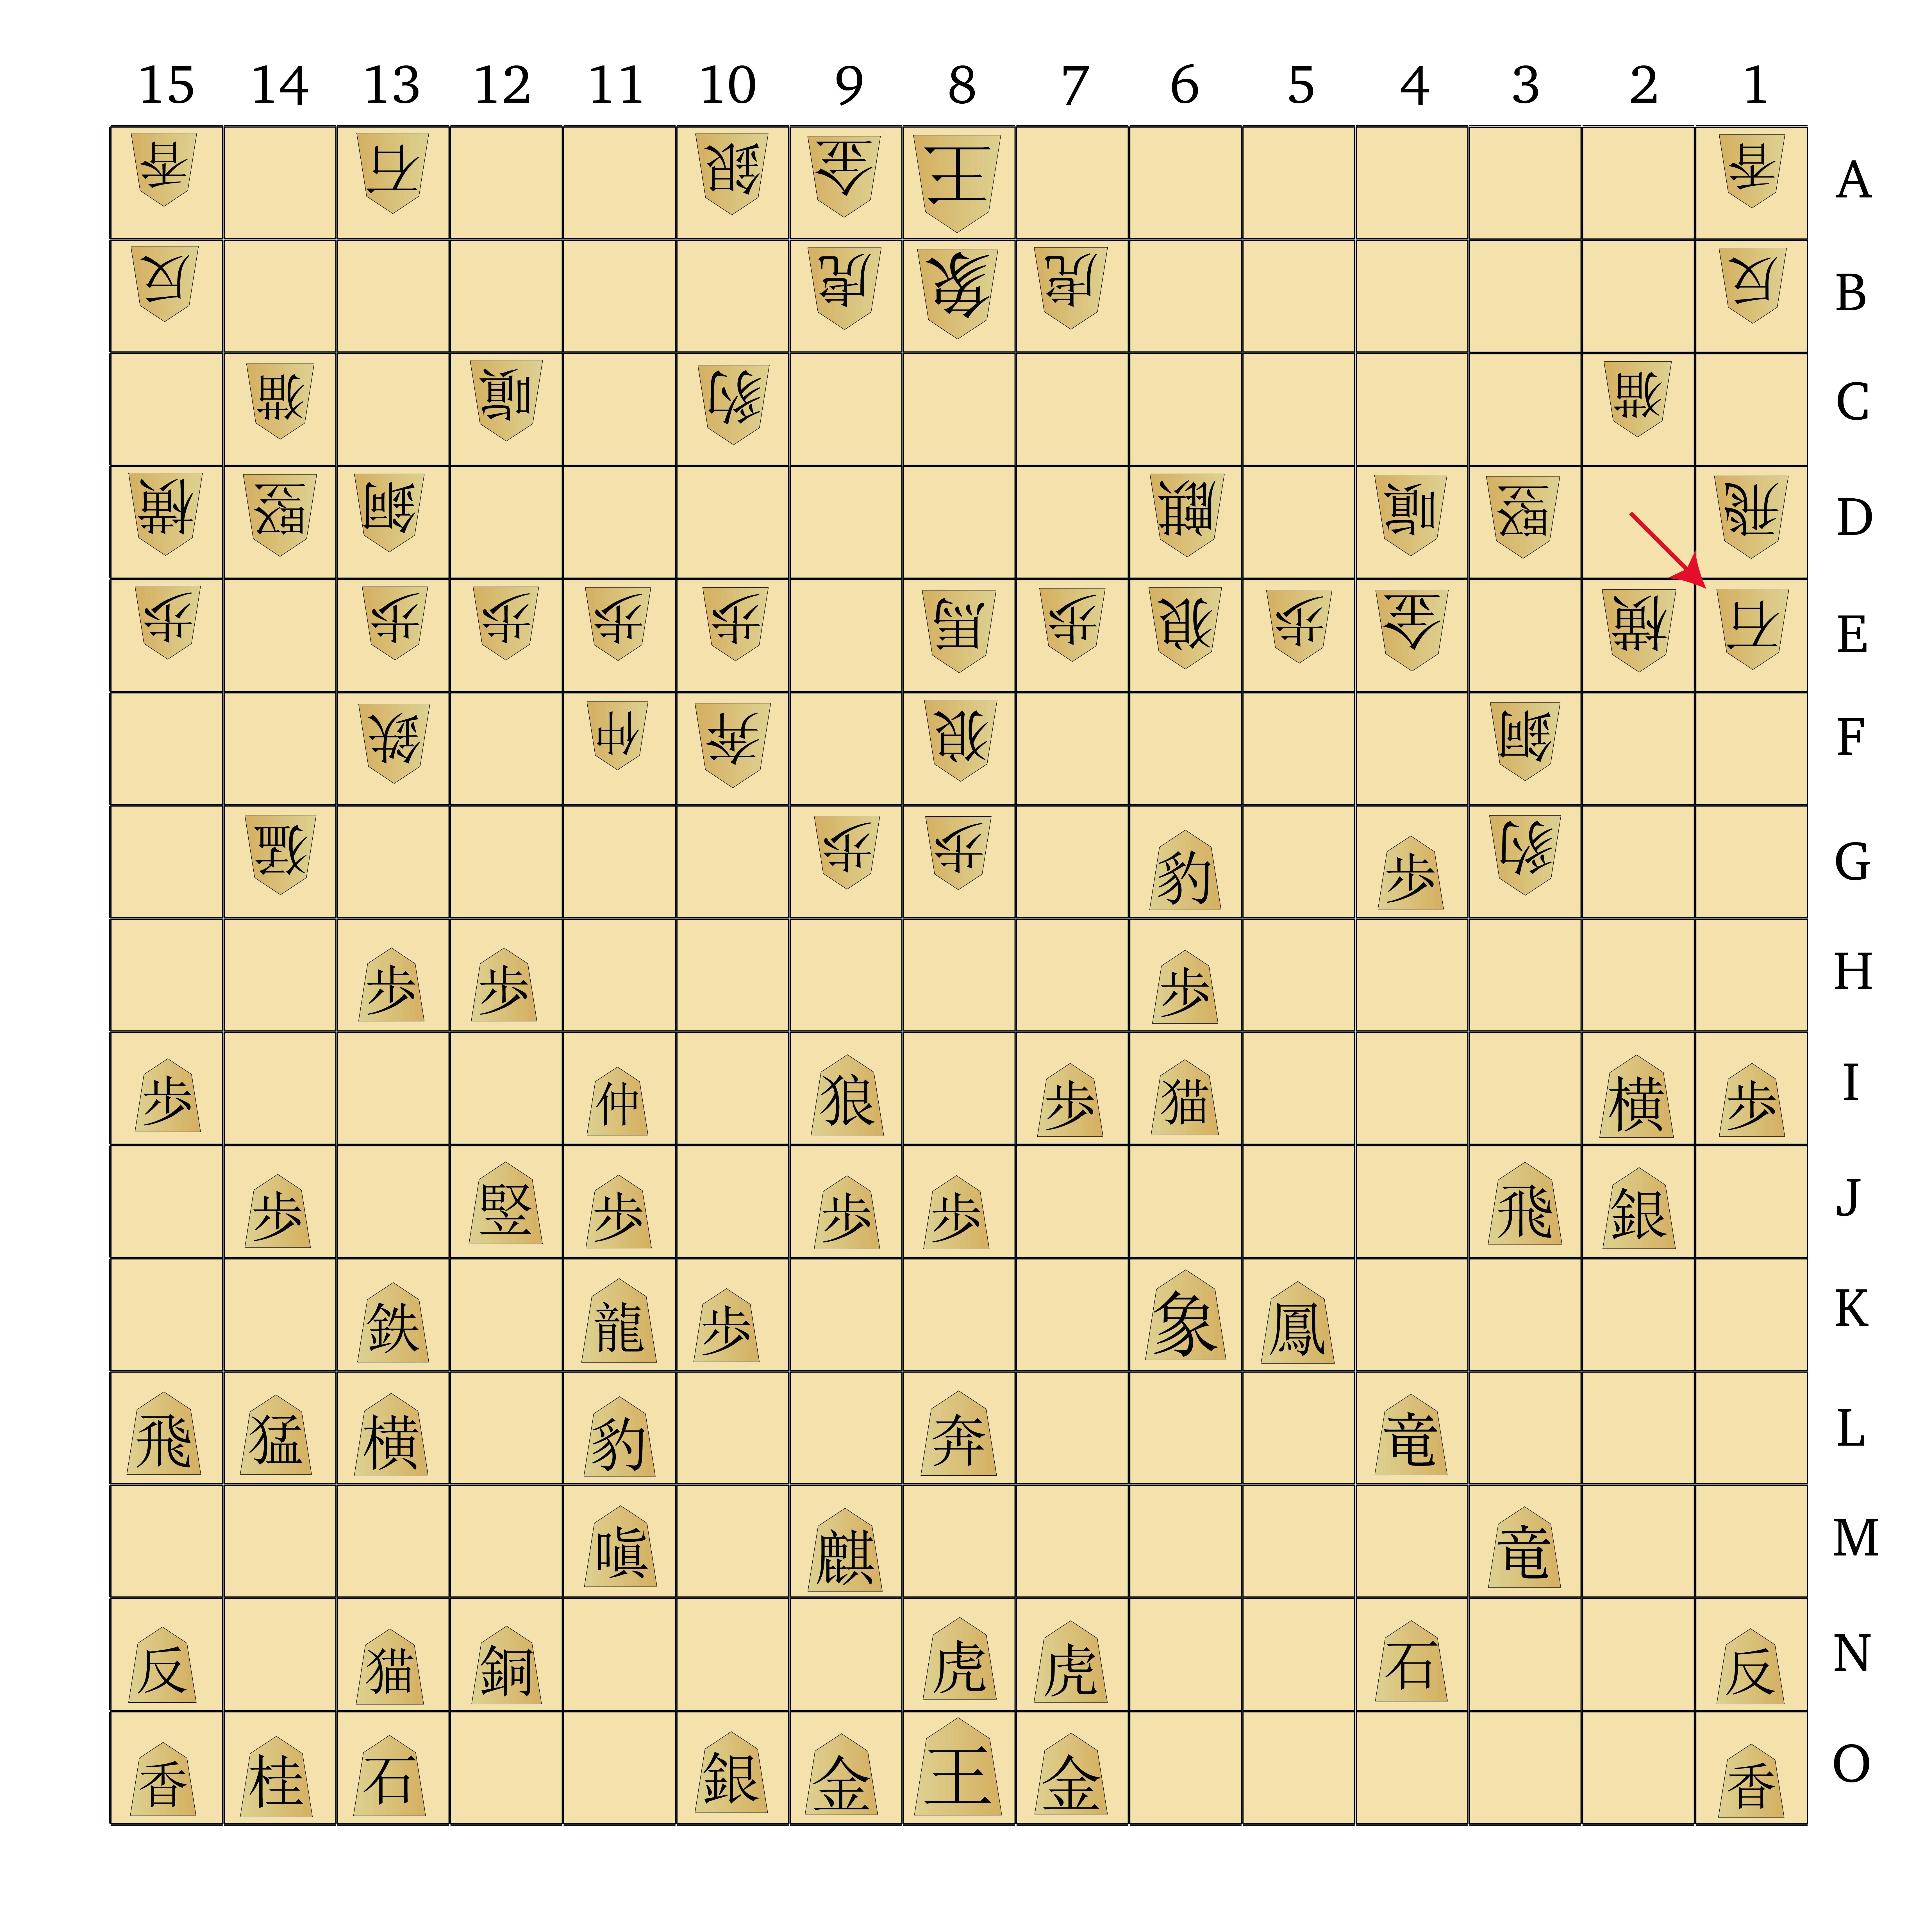 Dai Shogi 420 -- Move 280-01